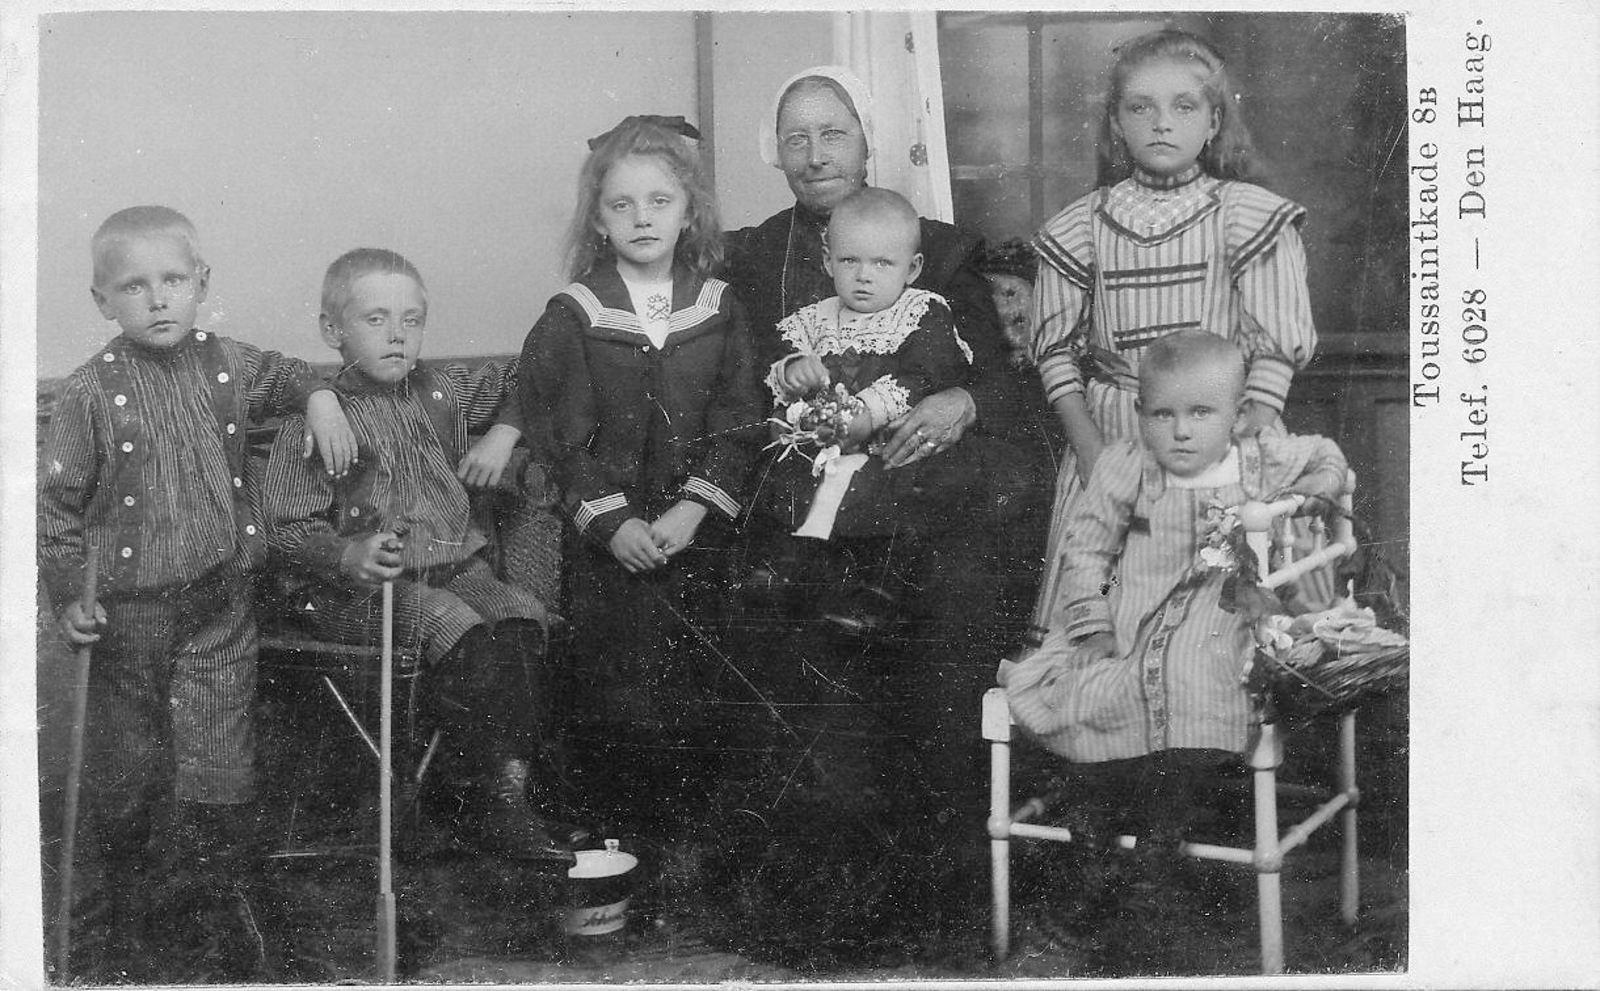 Zekveld Familie Onbekend Den Haag Vermeulen 19__ Portret 28